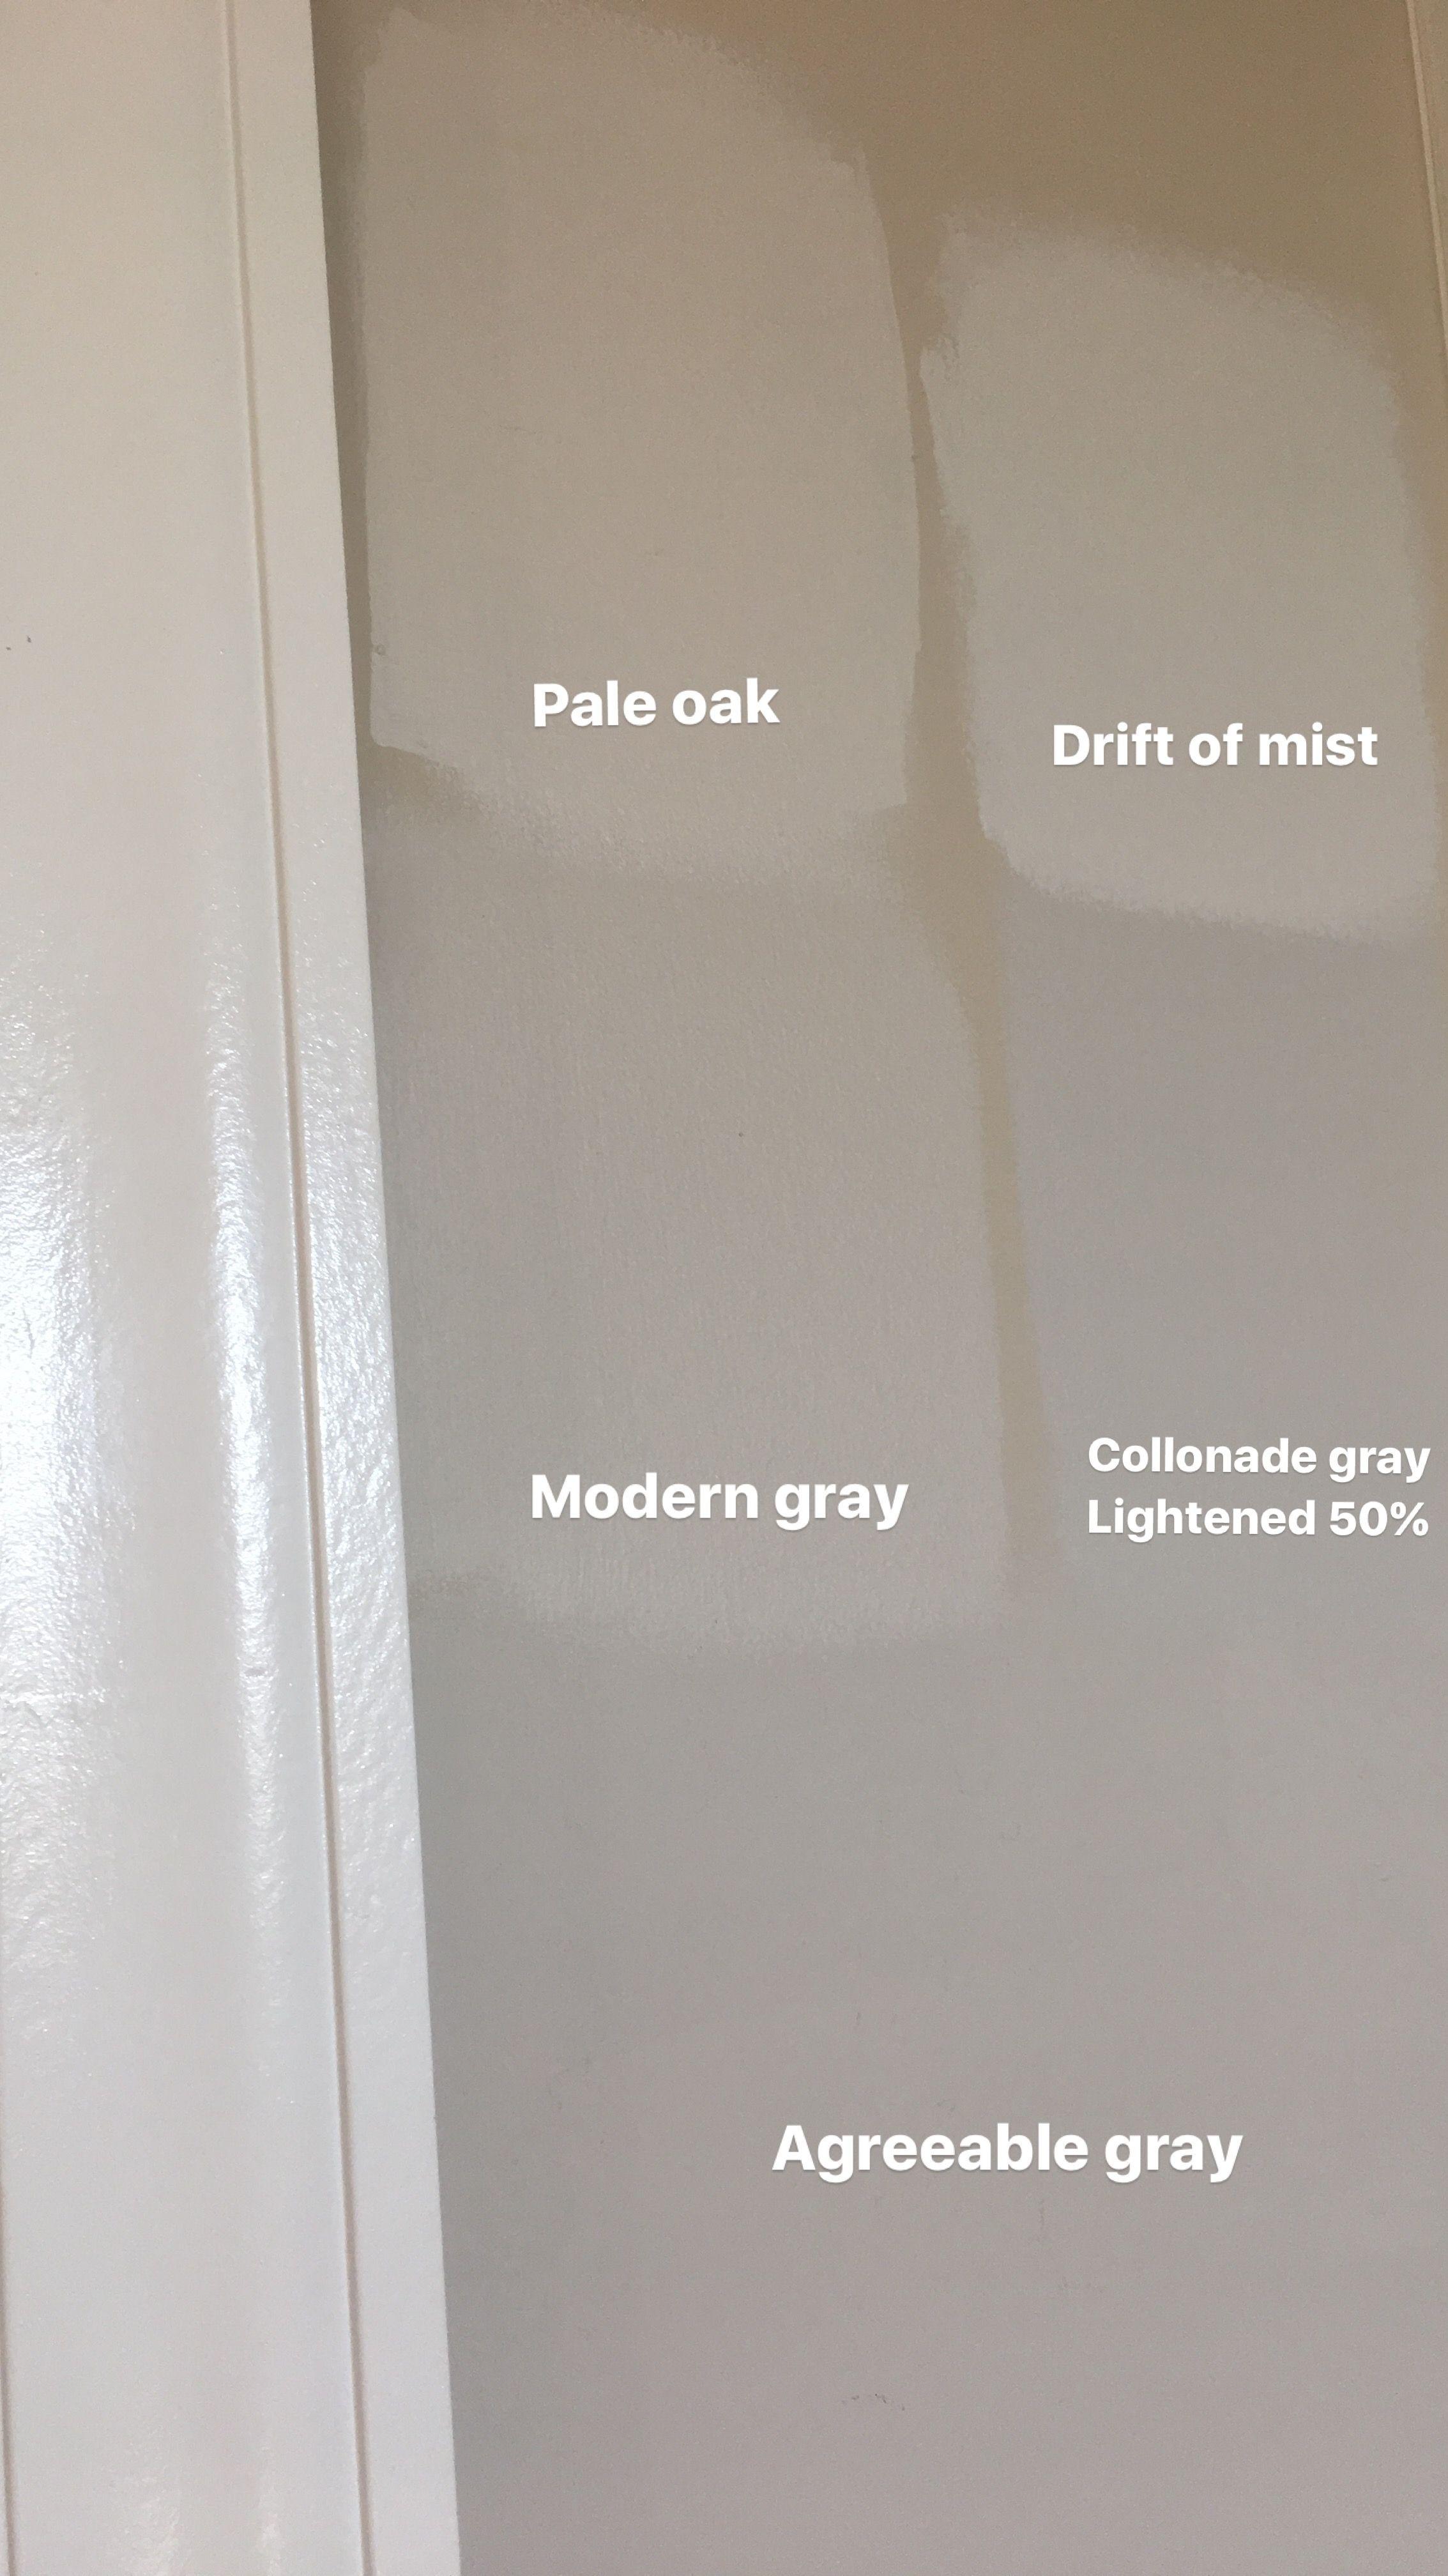 Pale Oak Modern Gray Drift Of Mist Colonnade Gray Agreeable